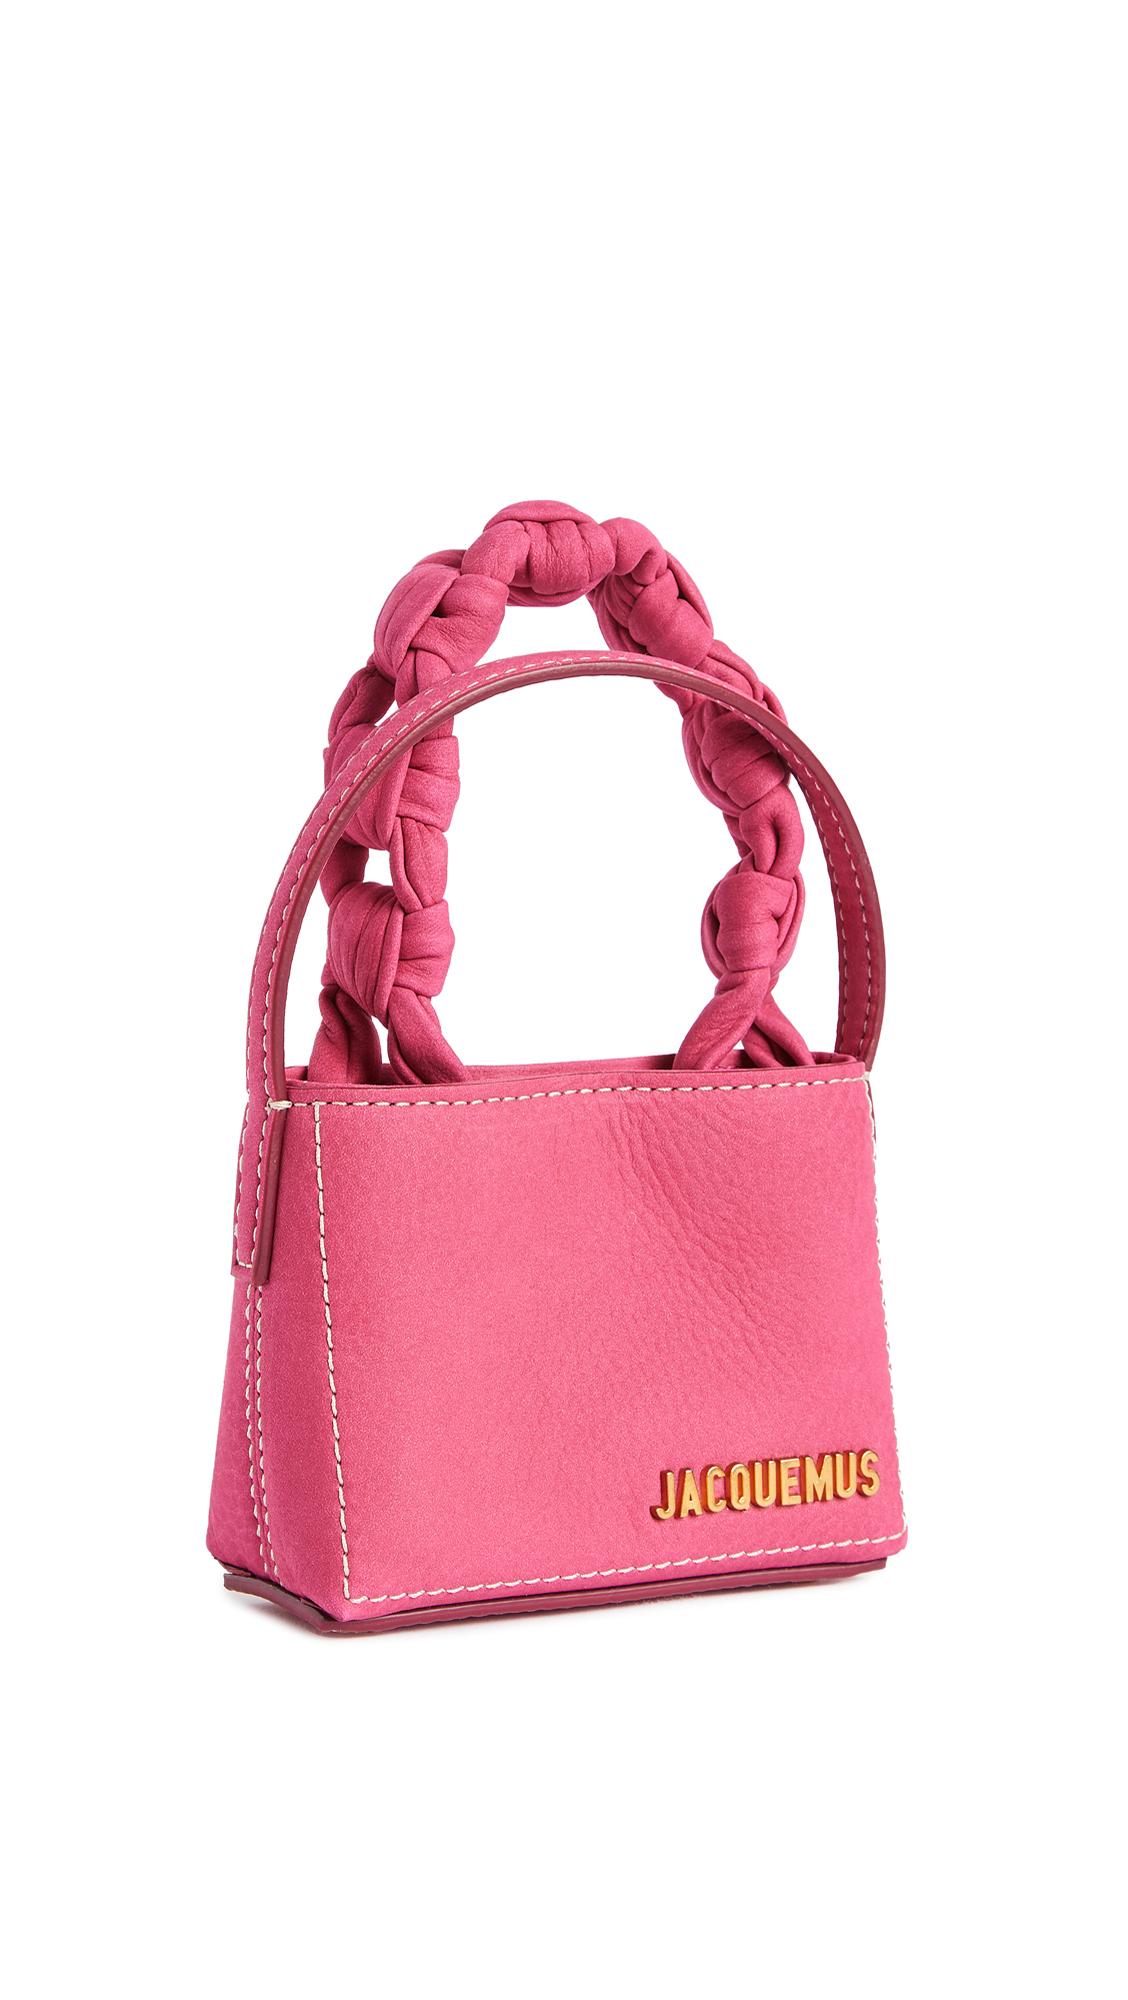 Jacquemus Braided Handle Mini Bag